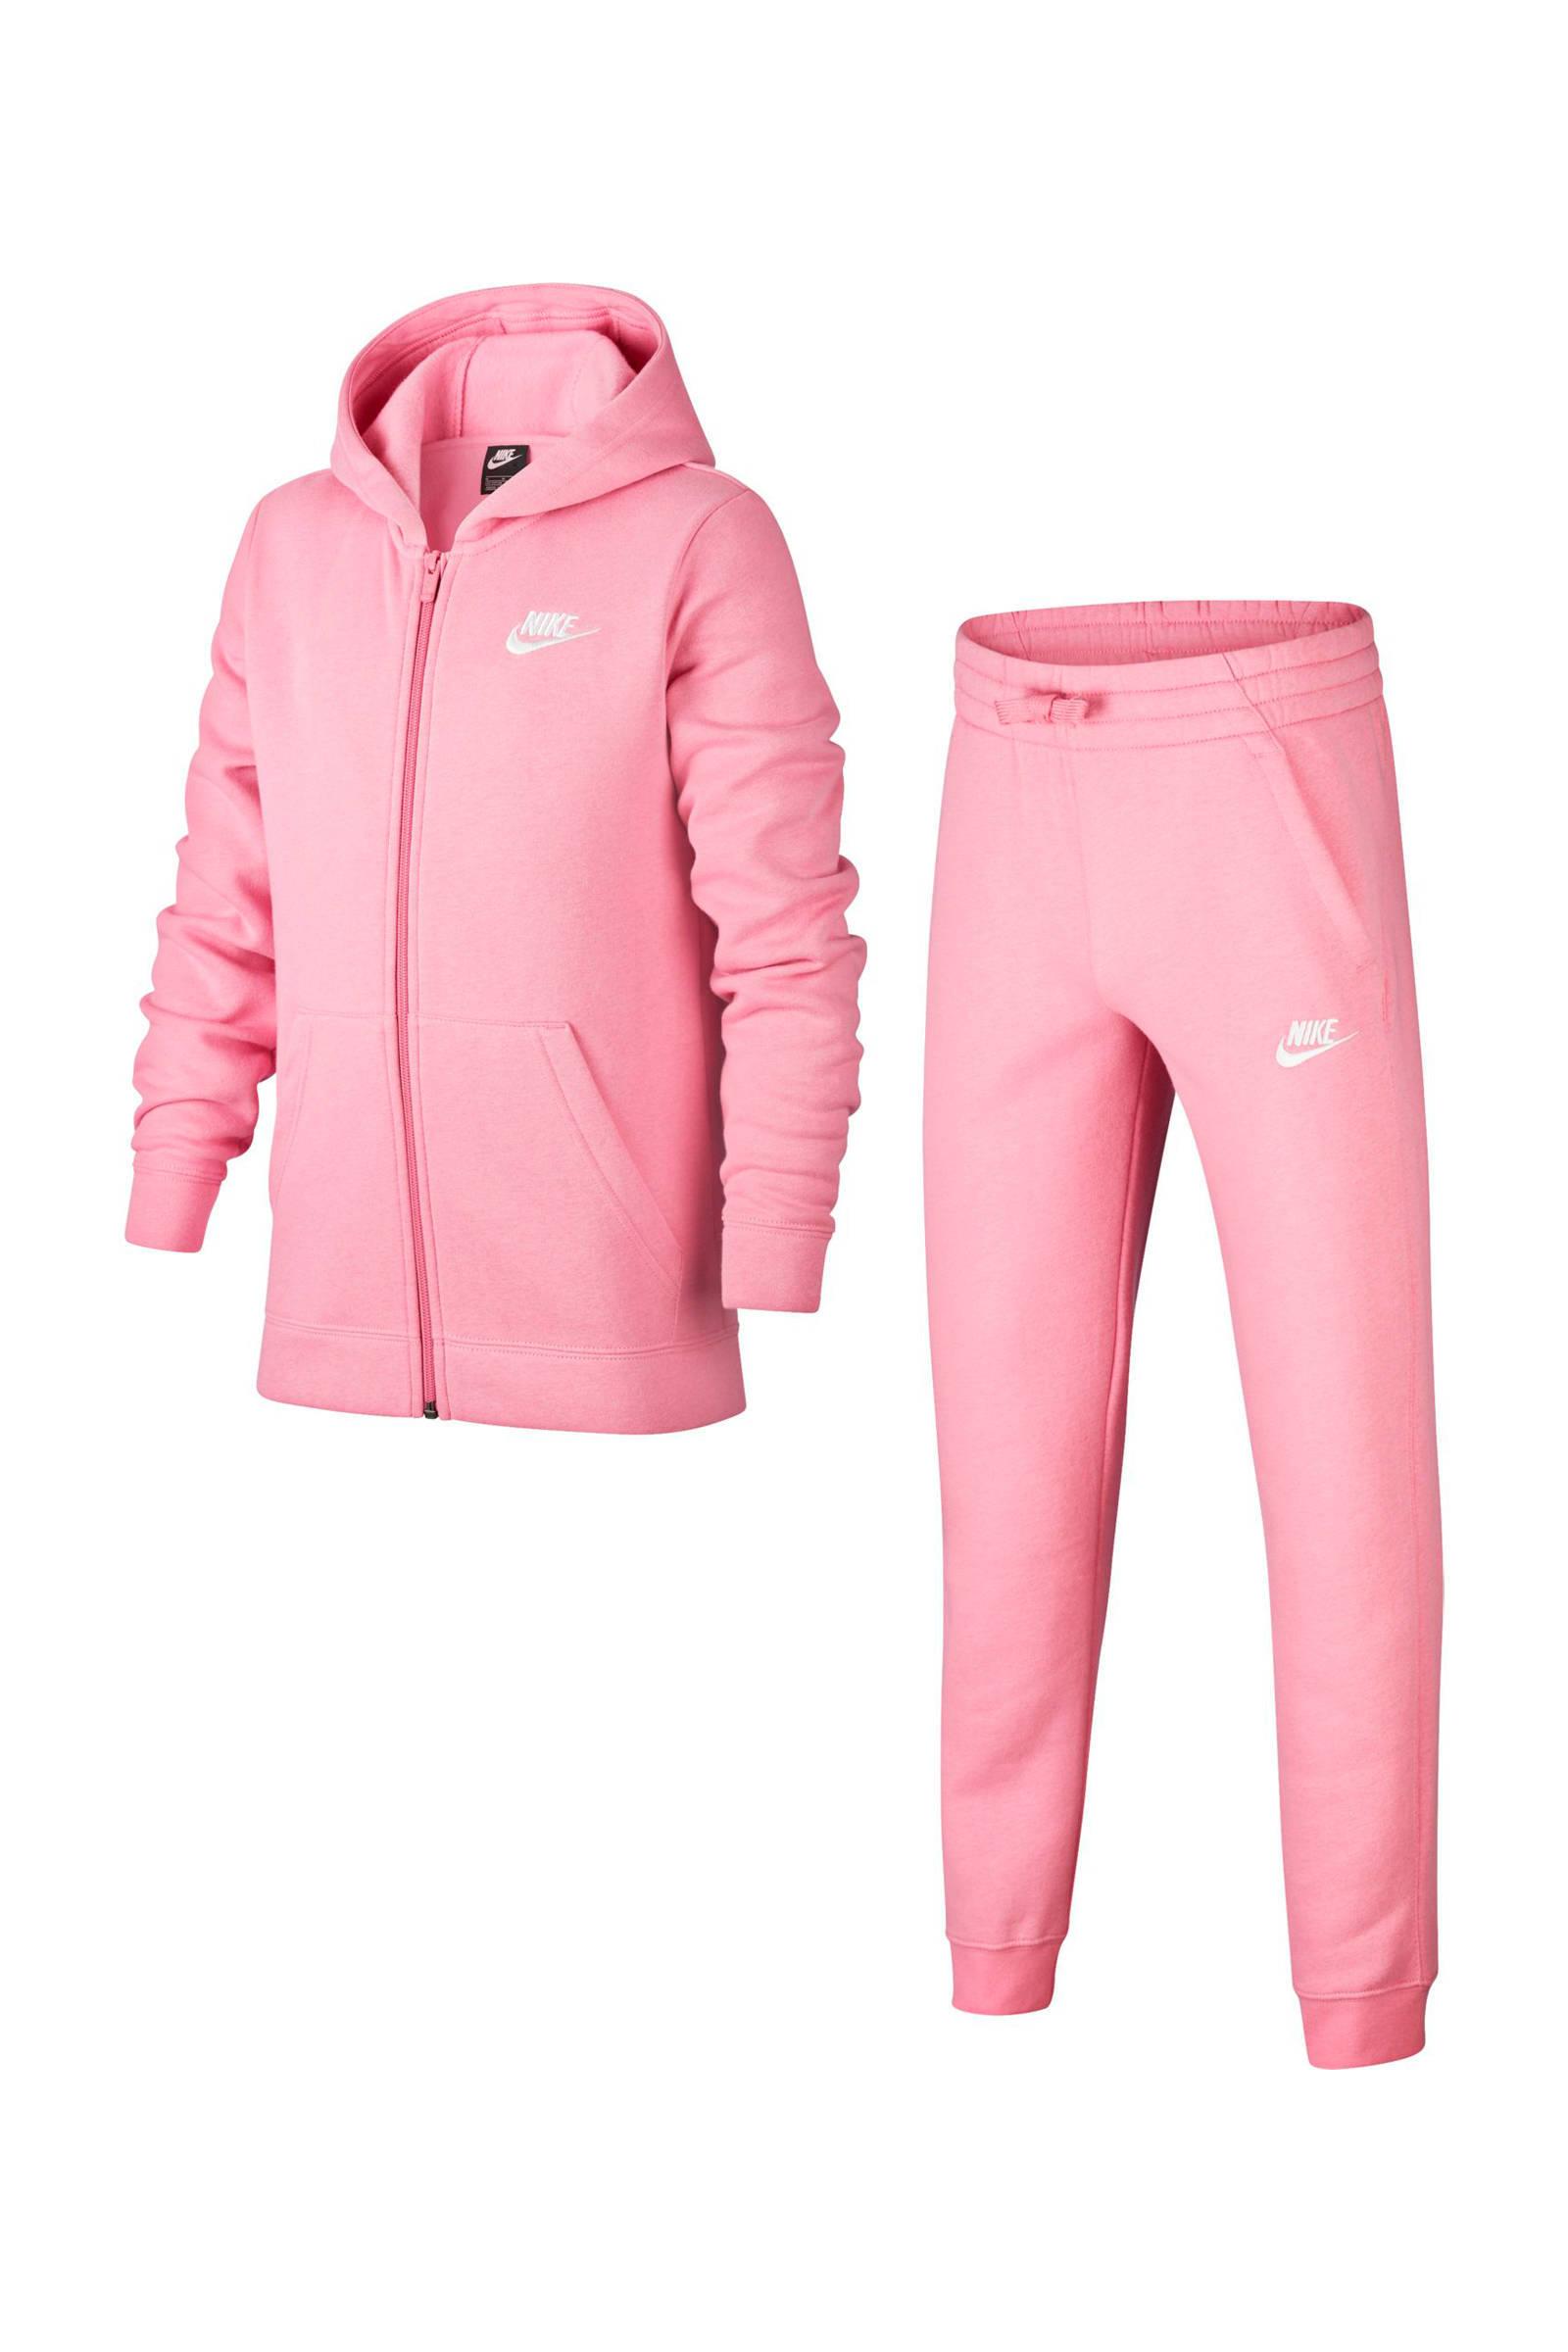 Nike trainingspak roze | wehkamp